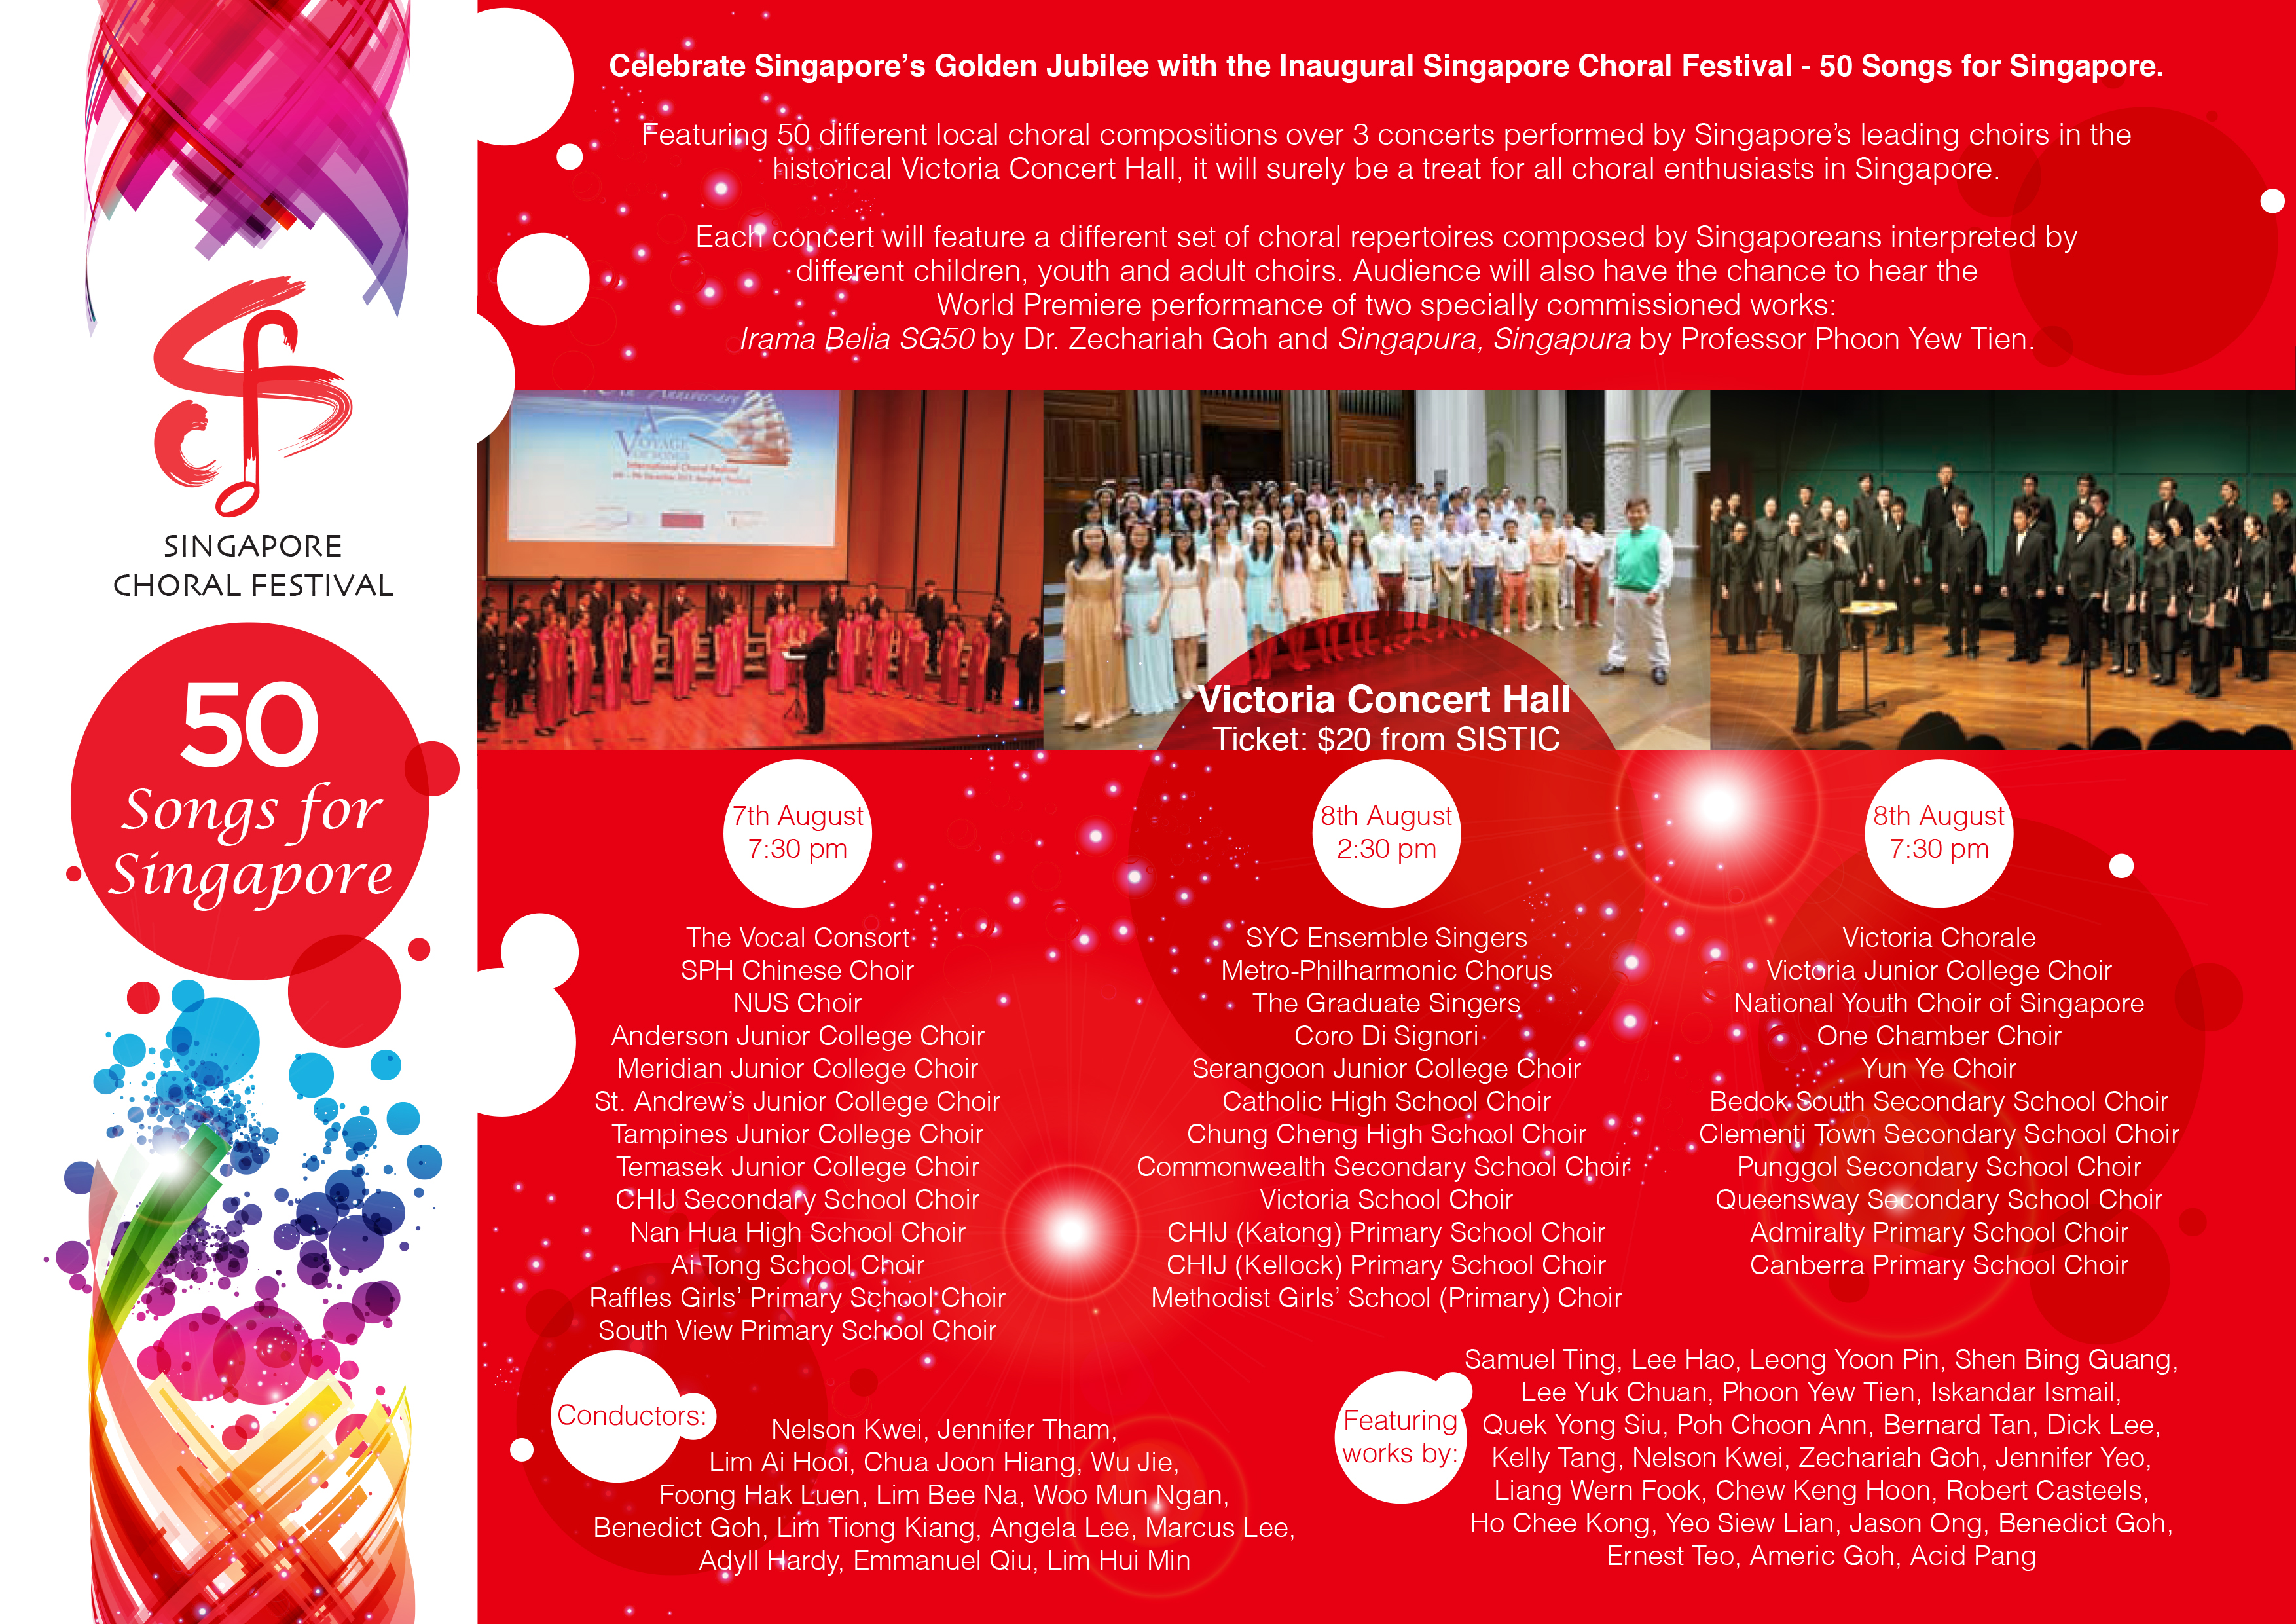 Singapore Choral Festival Info | International Choral